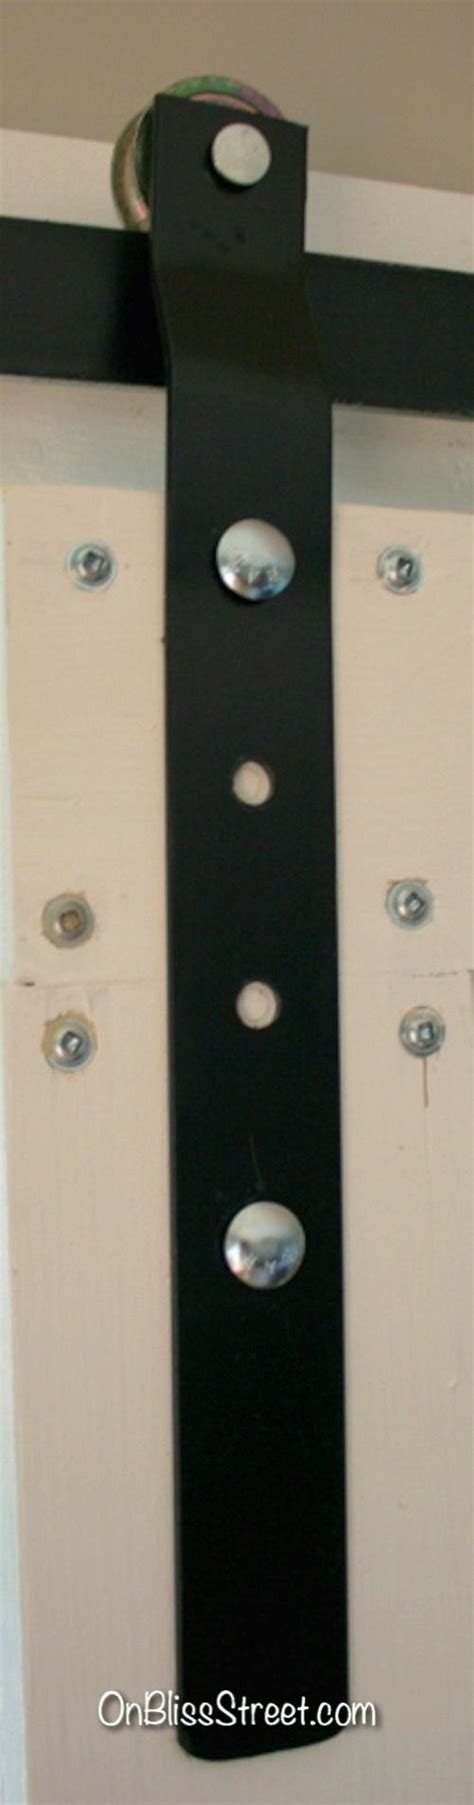 Cheap Sliding Barn Door Hardware 25 Best Ideas About Cheap Barn Door Hardware On